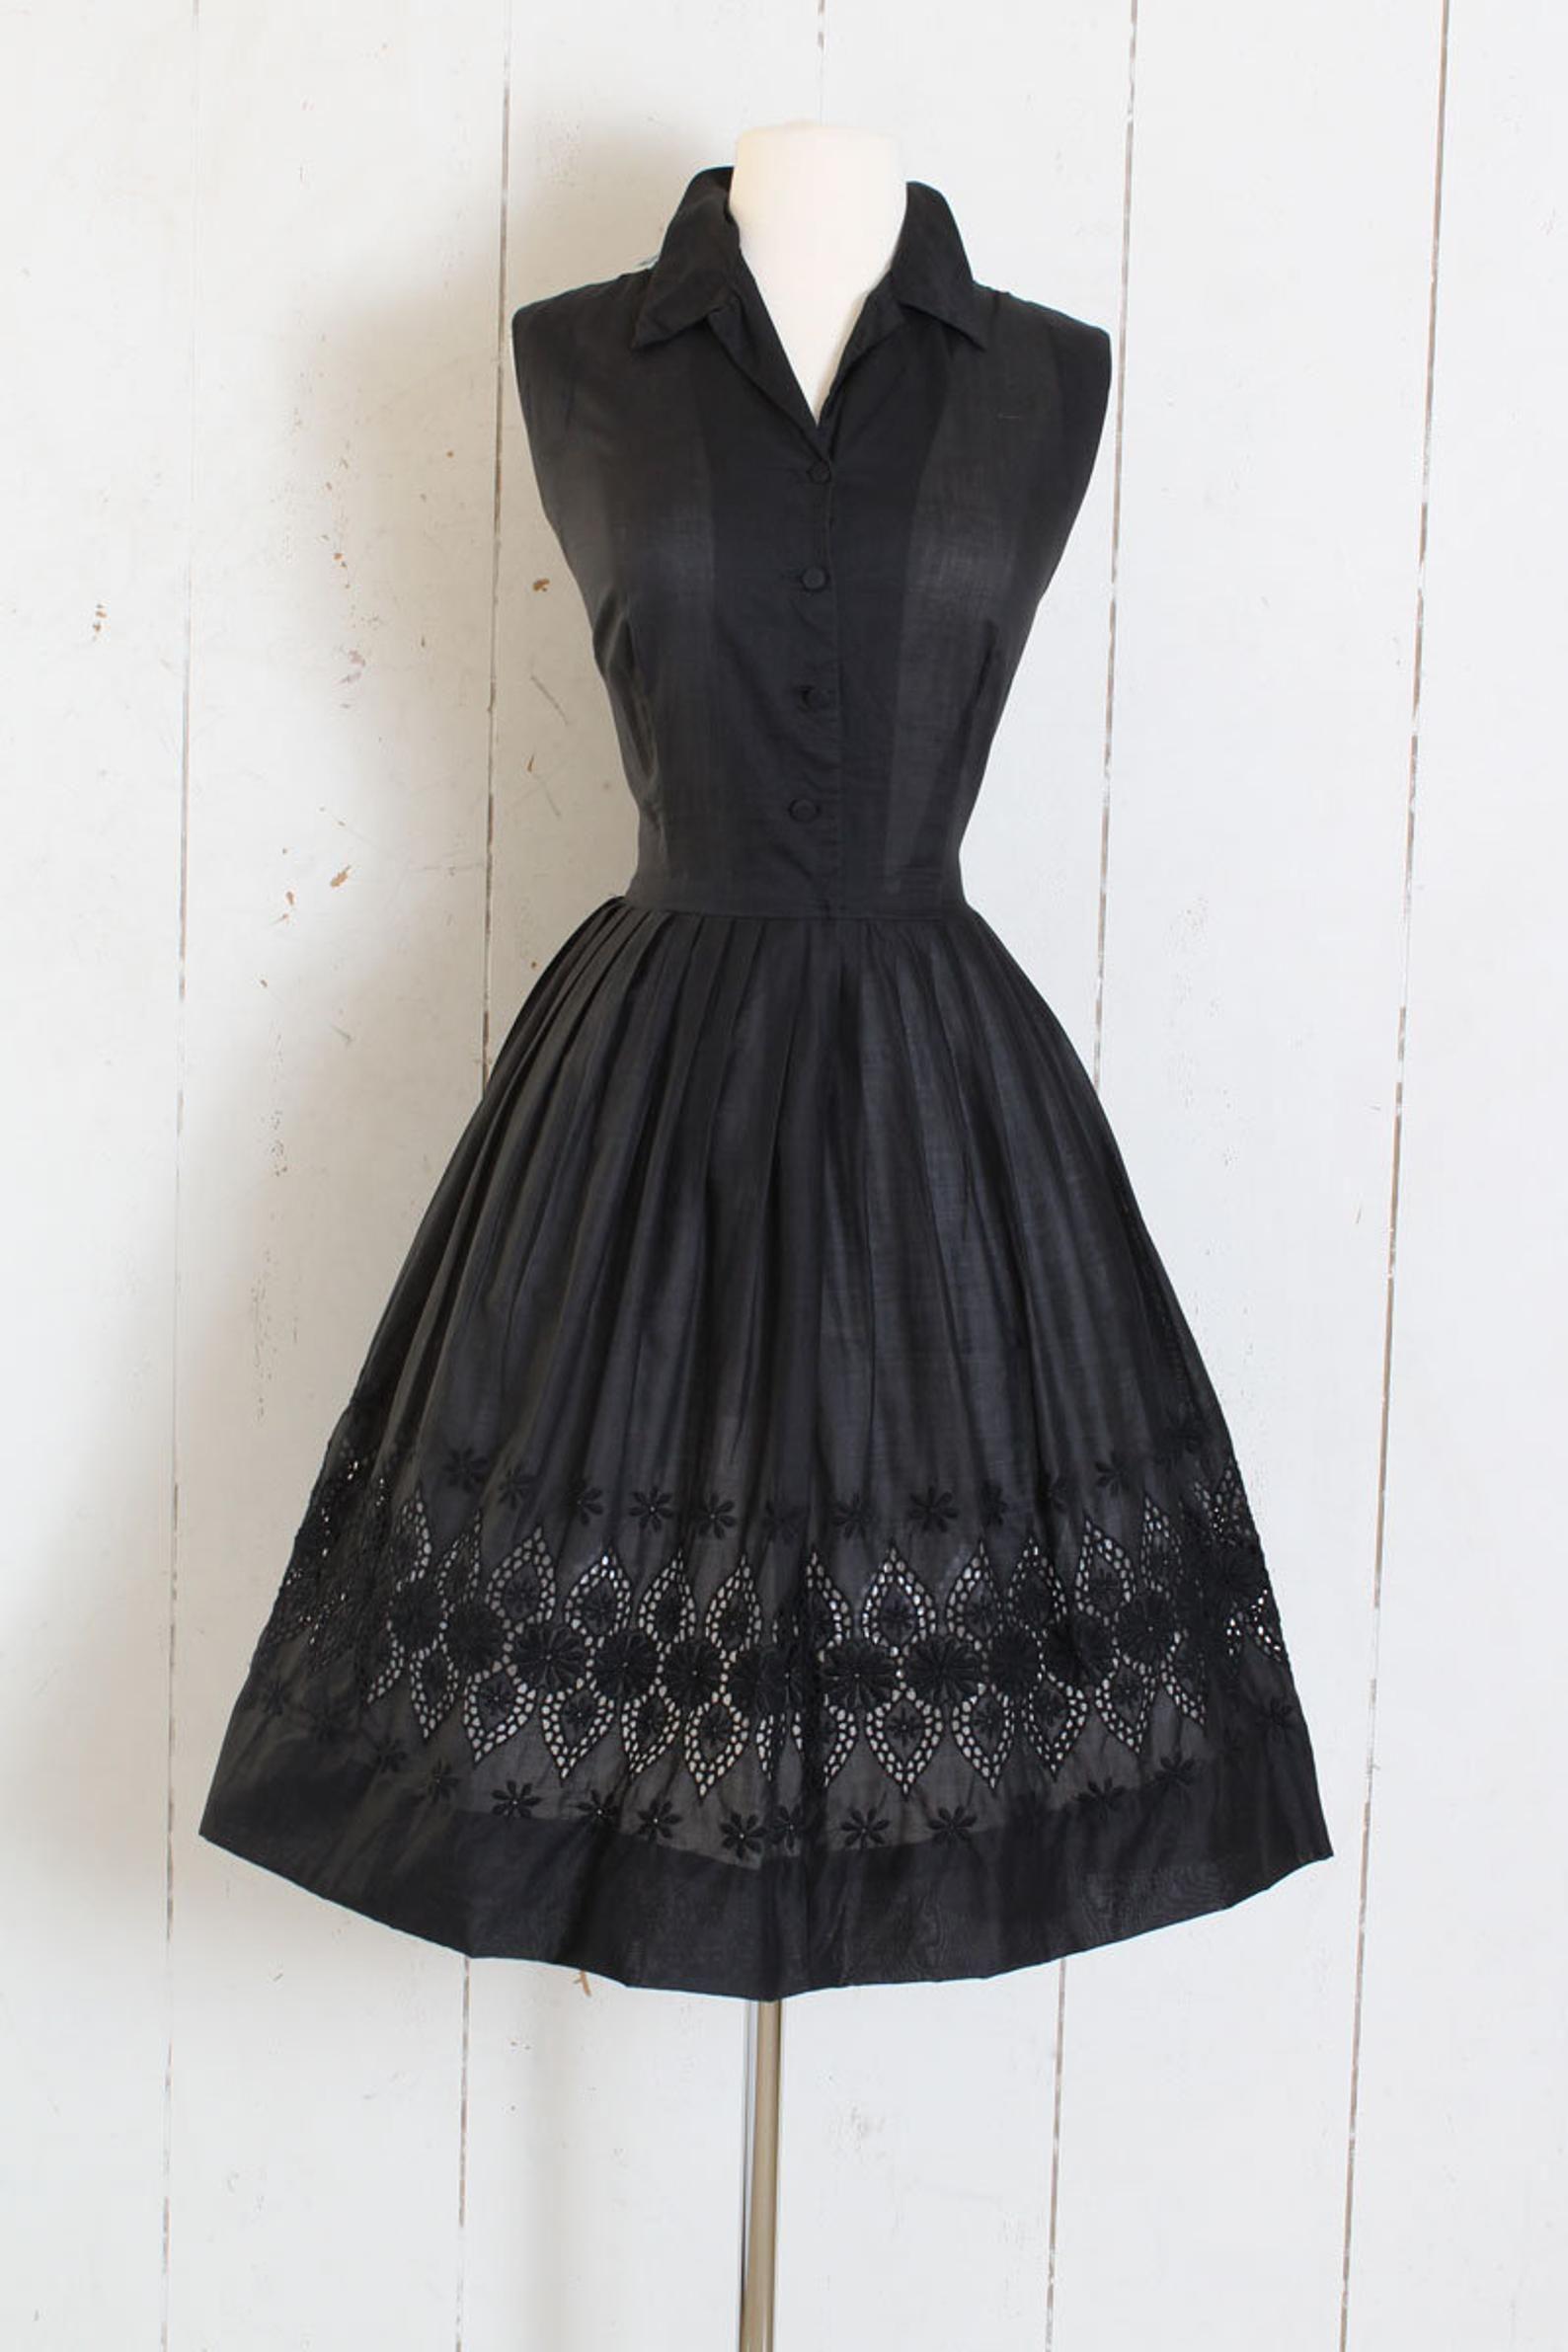 Vintage 1950s Dress Vintage 50s Black Eyelet Embroidered Etsy Vintage Dresses Vintage 1950s Dresses Vintage Black Dress [ 2382 x 1588 Pixel ]